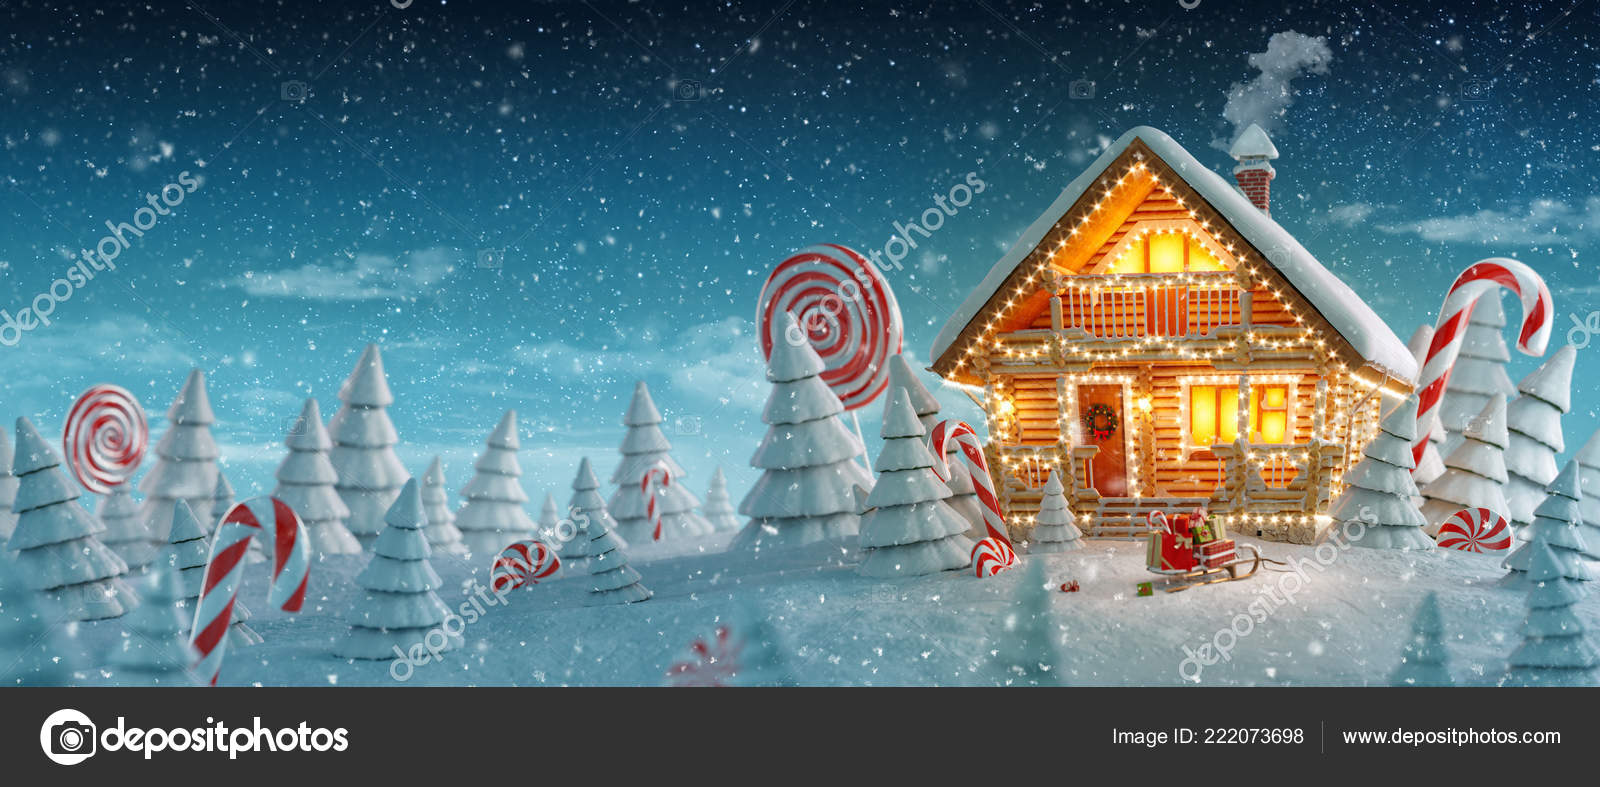 3d Weihnachtsbeleuchtung.Erstaunliche Blockhaus Dekoriert Der Weihnachtsbeleuchtung